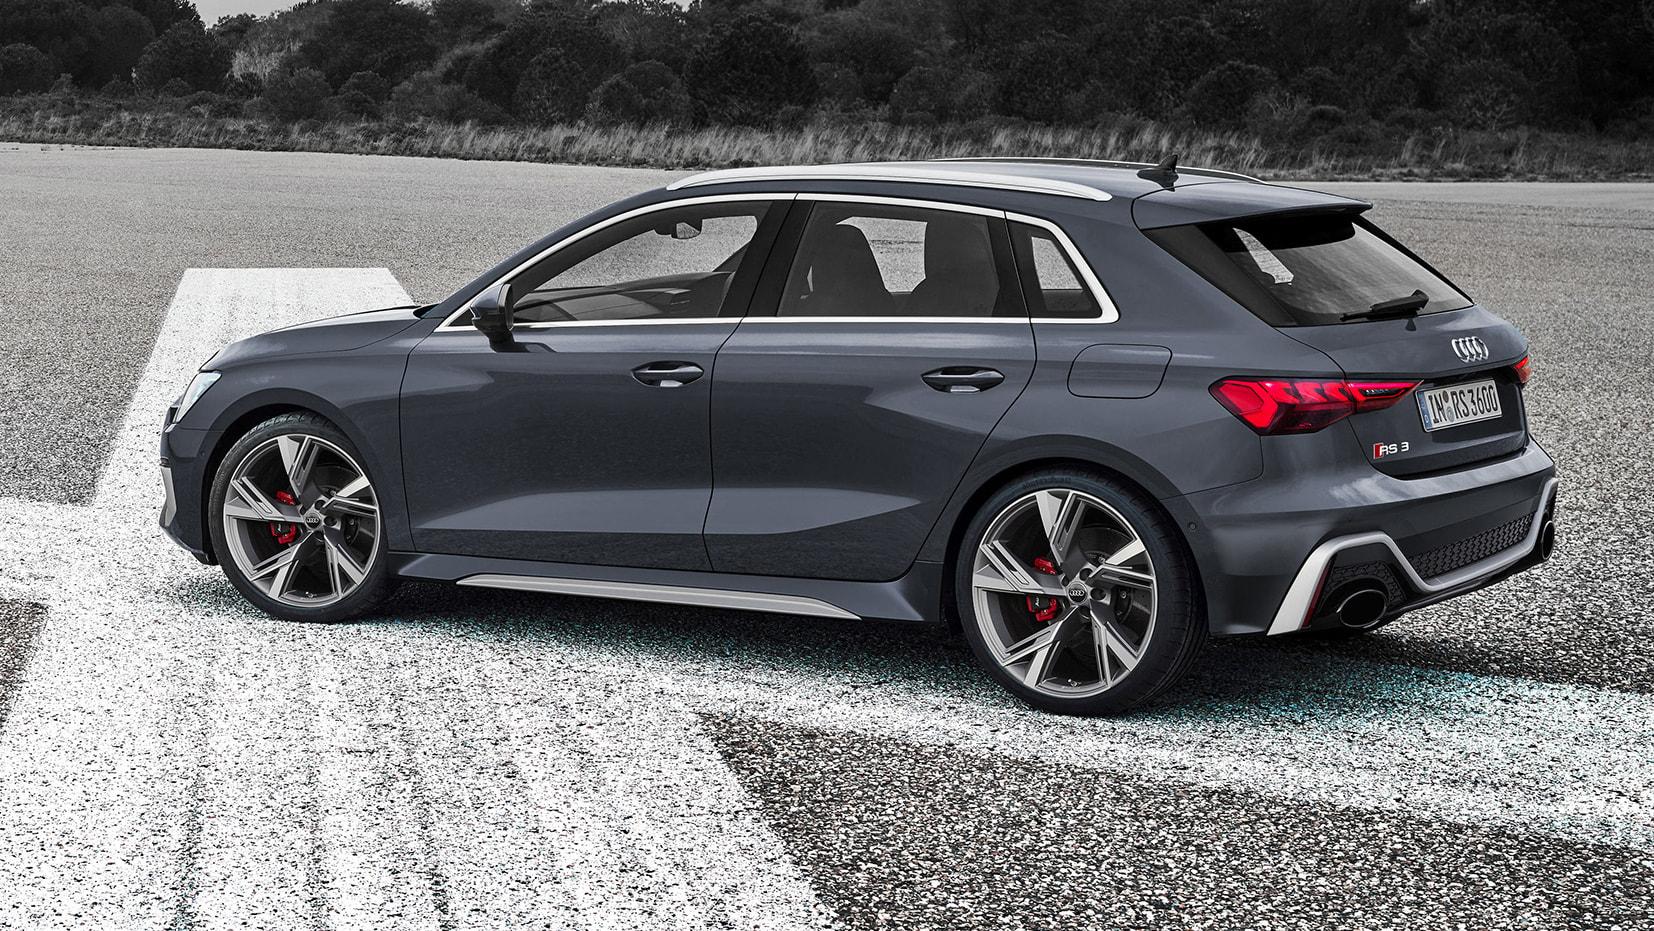 2021 Audi Rs3 Sportback And Sedan Spied Caradvice